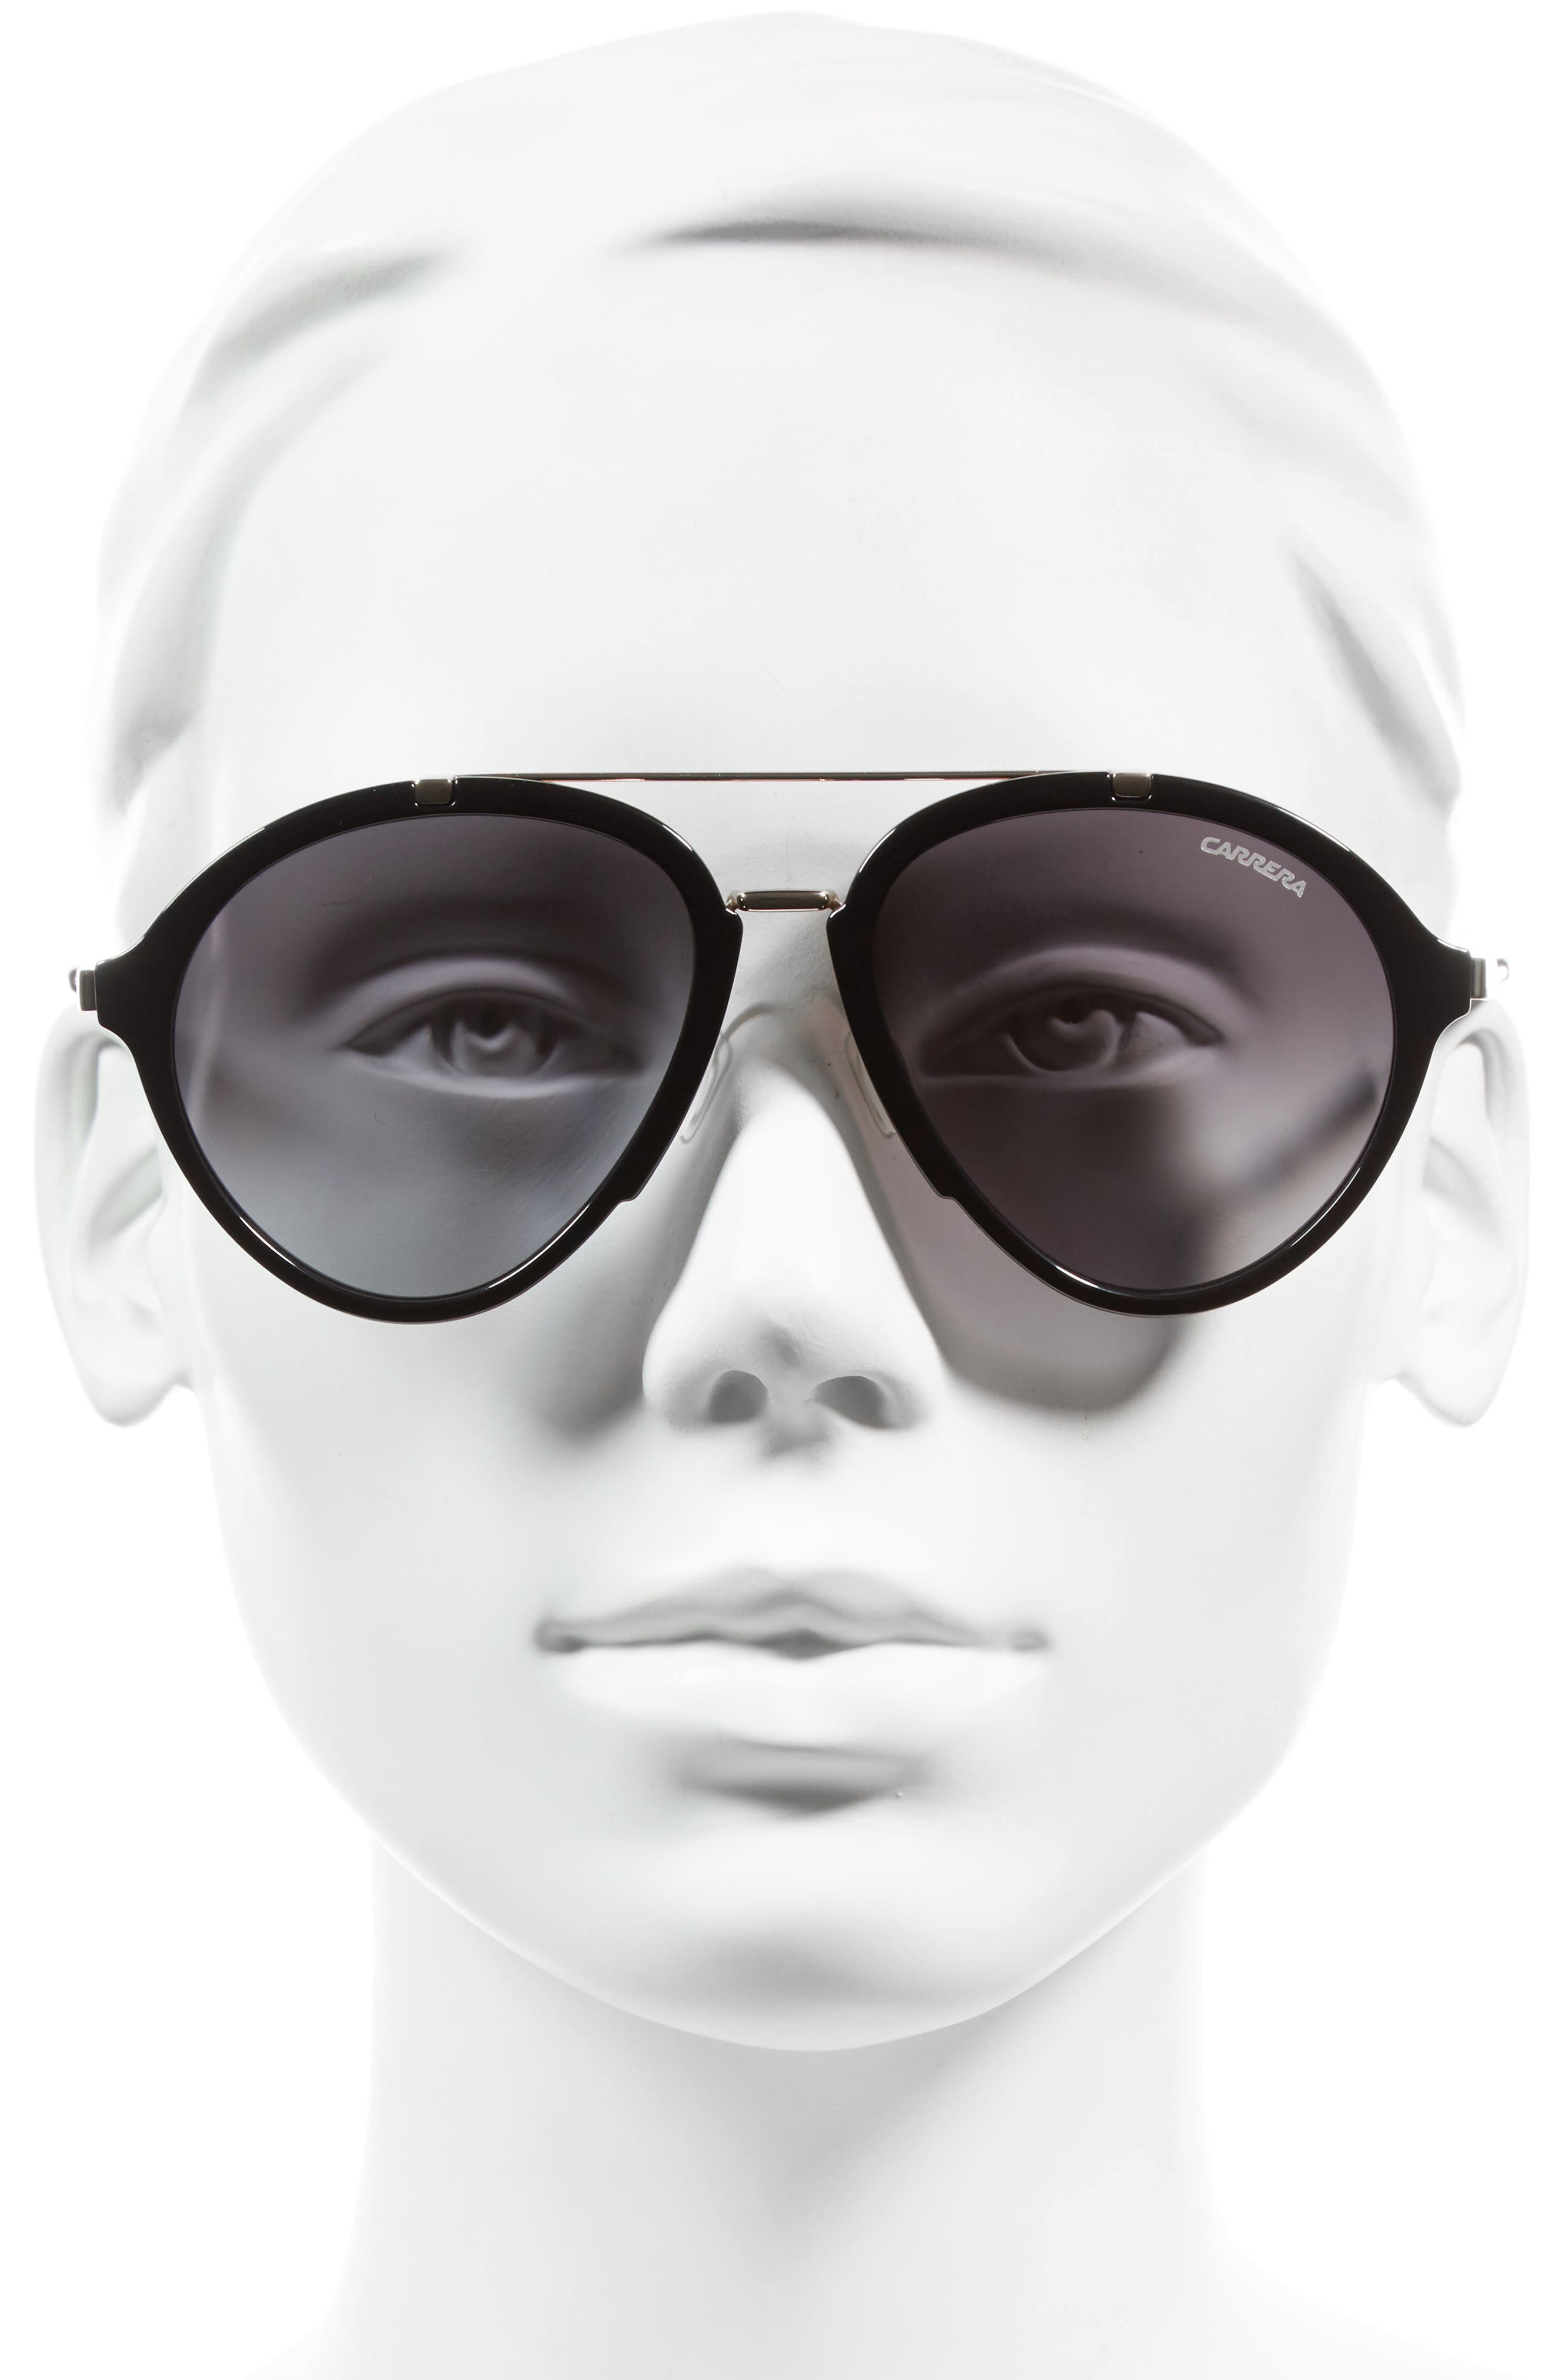 54mm Gradient Aviator Sunglasses,                             Alternate thumbnail 2, color,                             001